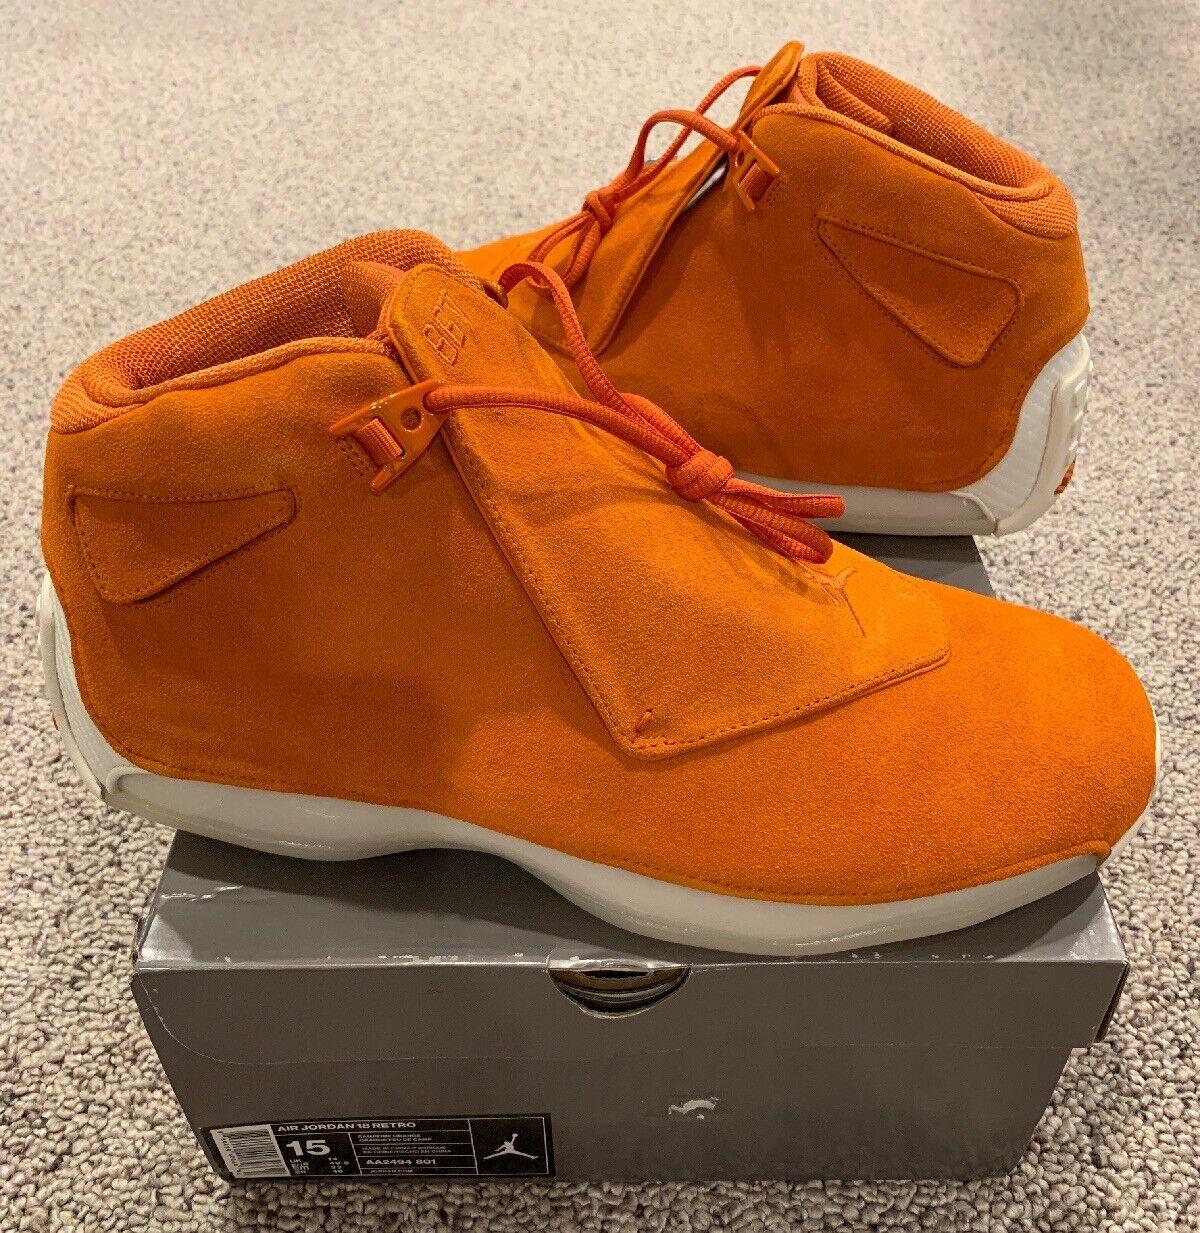 Nike Air Jordan Retro 18 XVIII Campfire orange Suede Size 15 New DS 2018 Sample